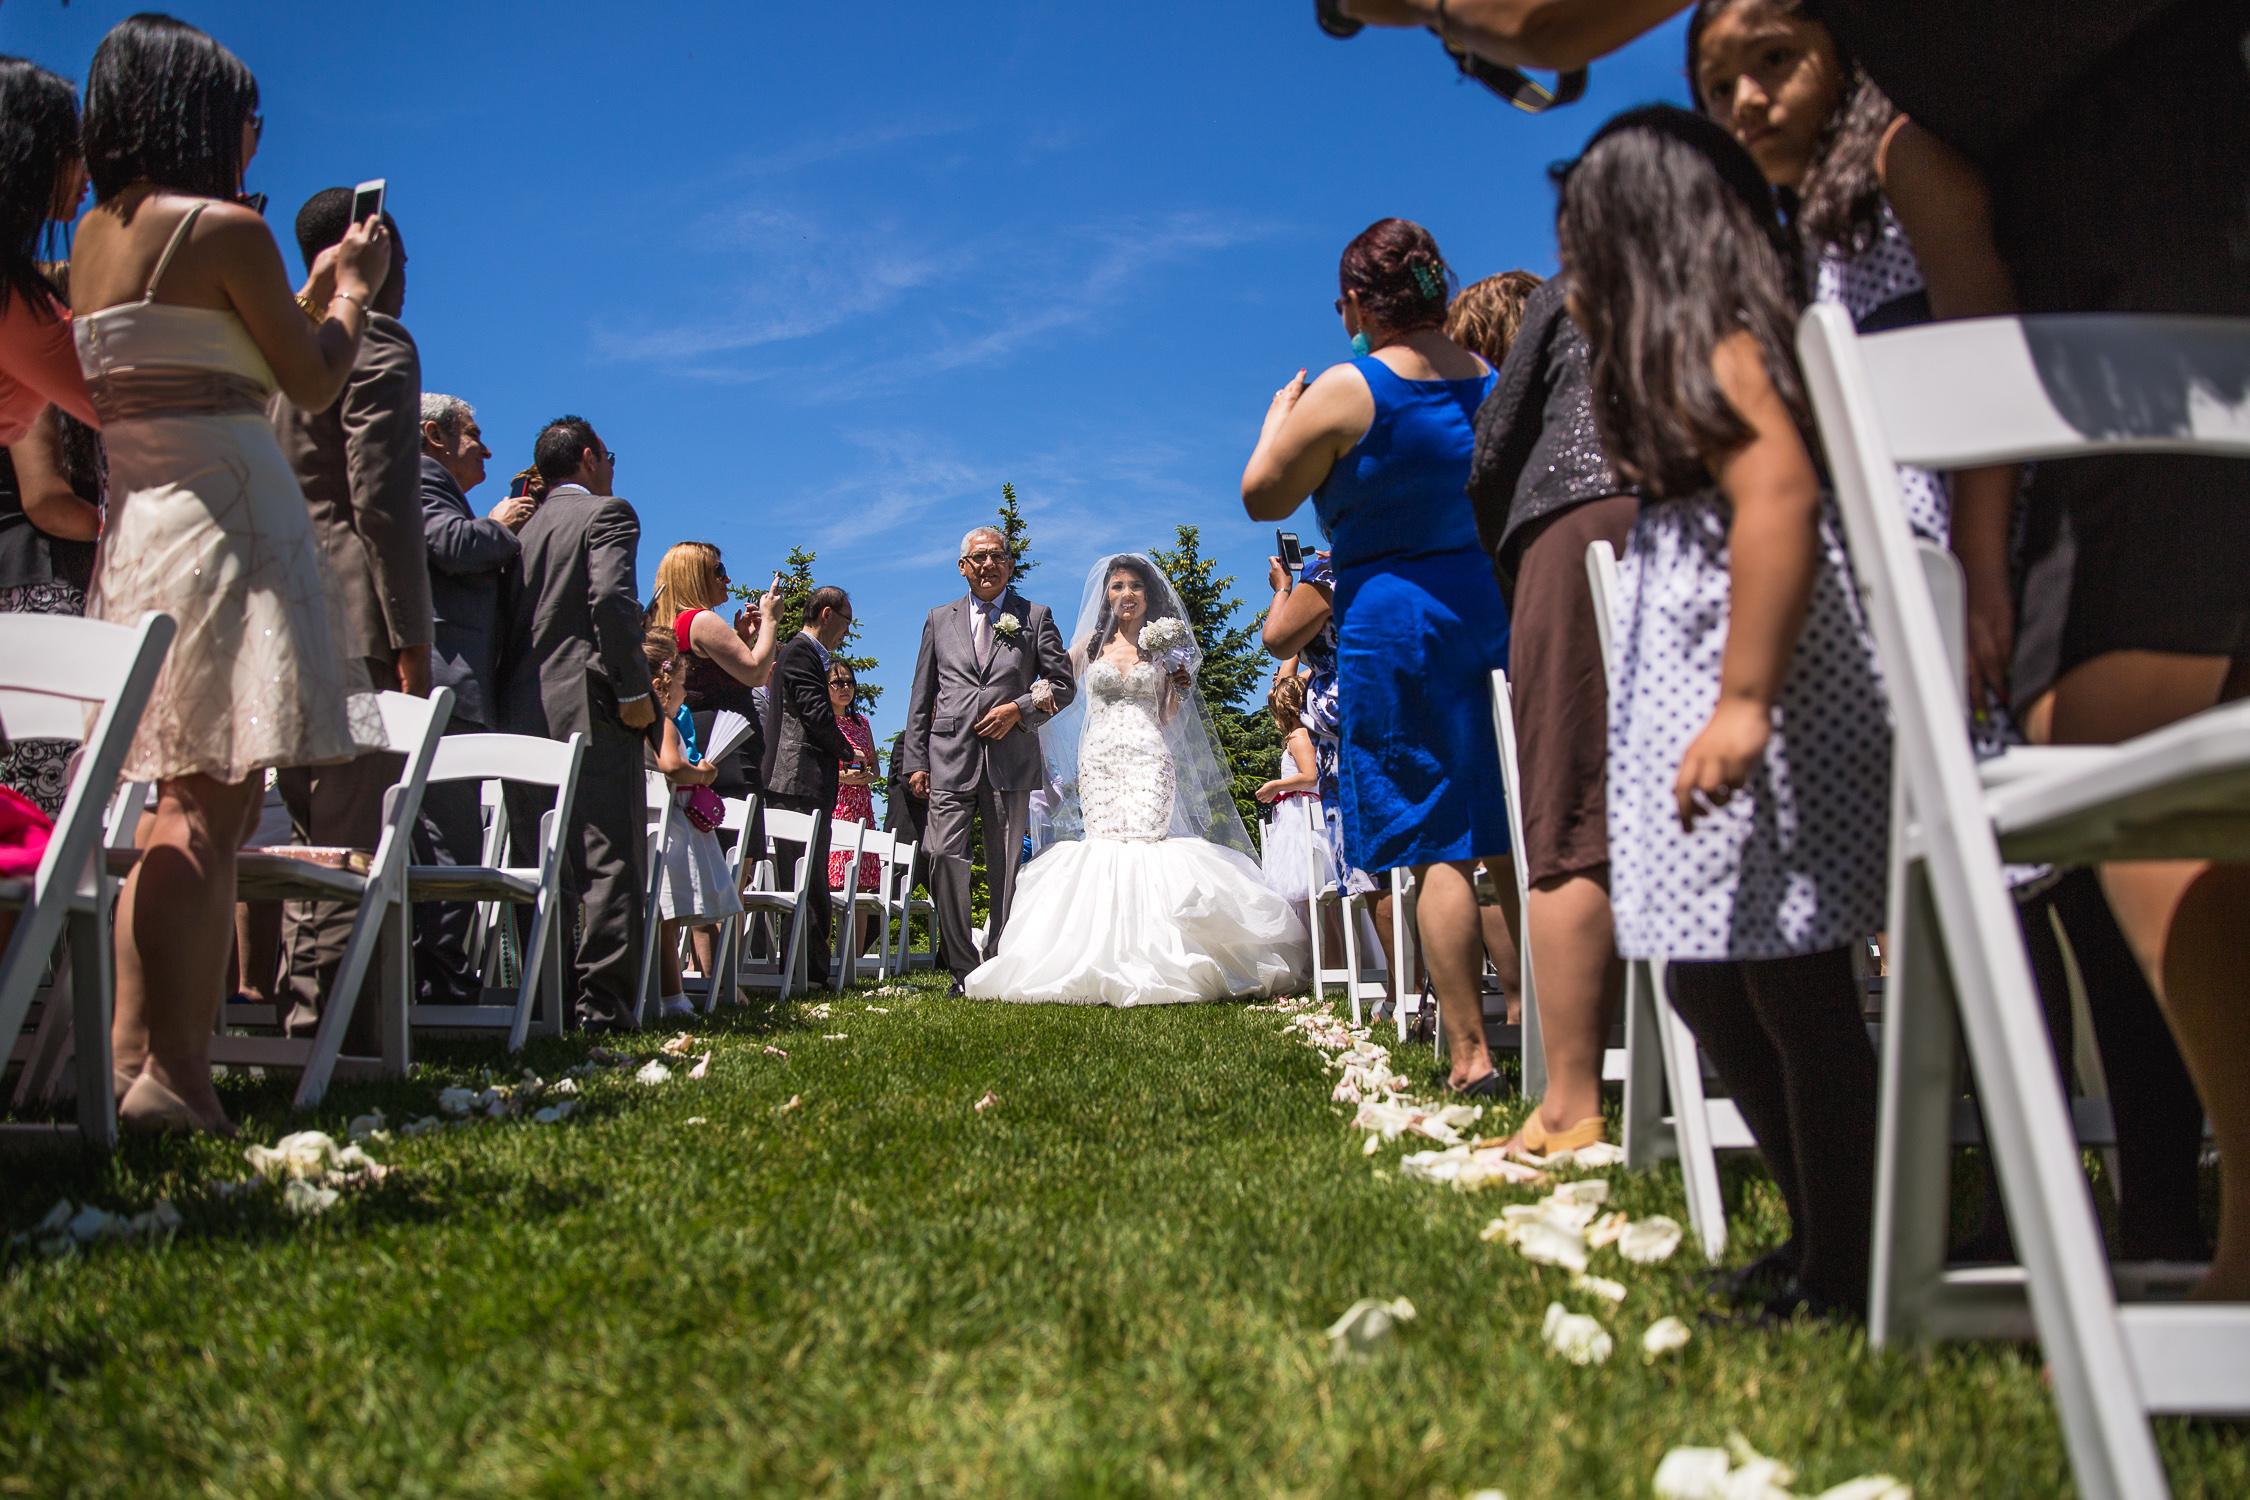 Paradise-Banquet-Hall-Wedding-Vaughan-Ontario-0037.jpg